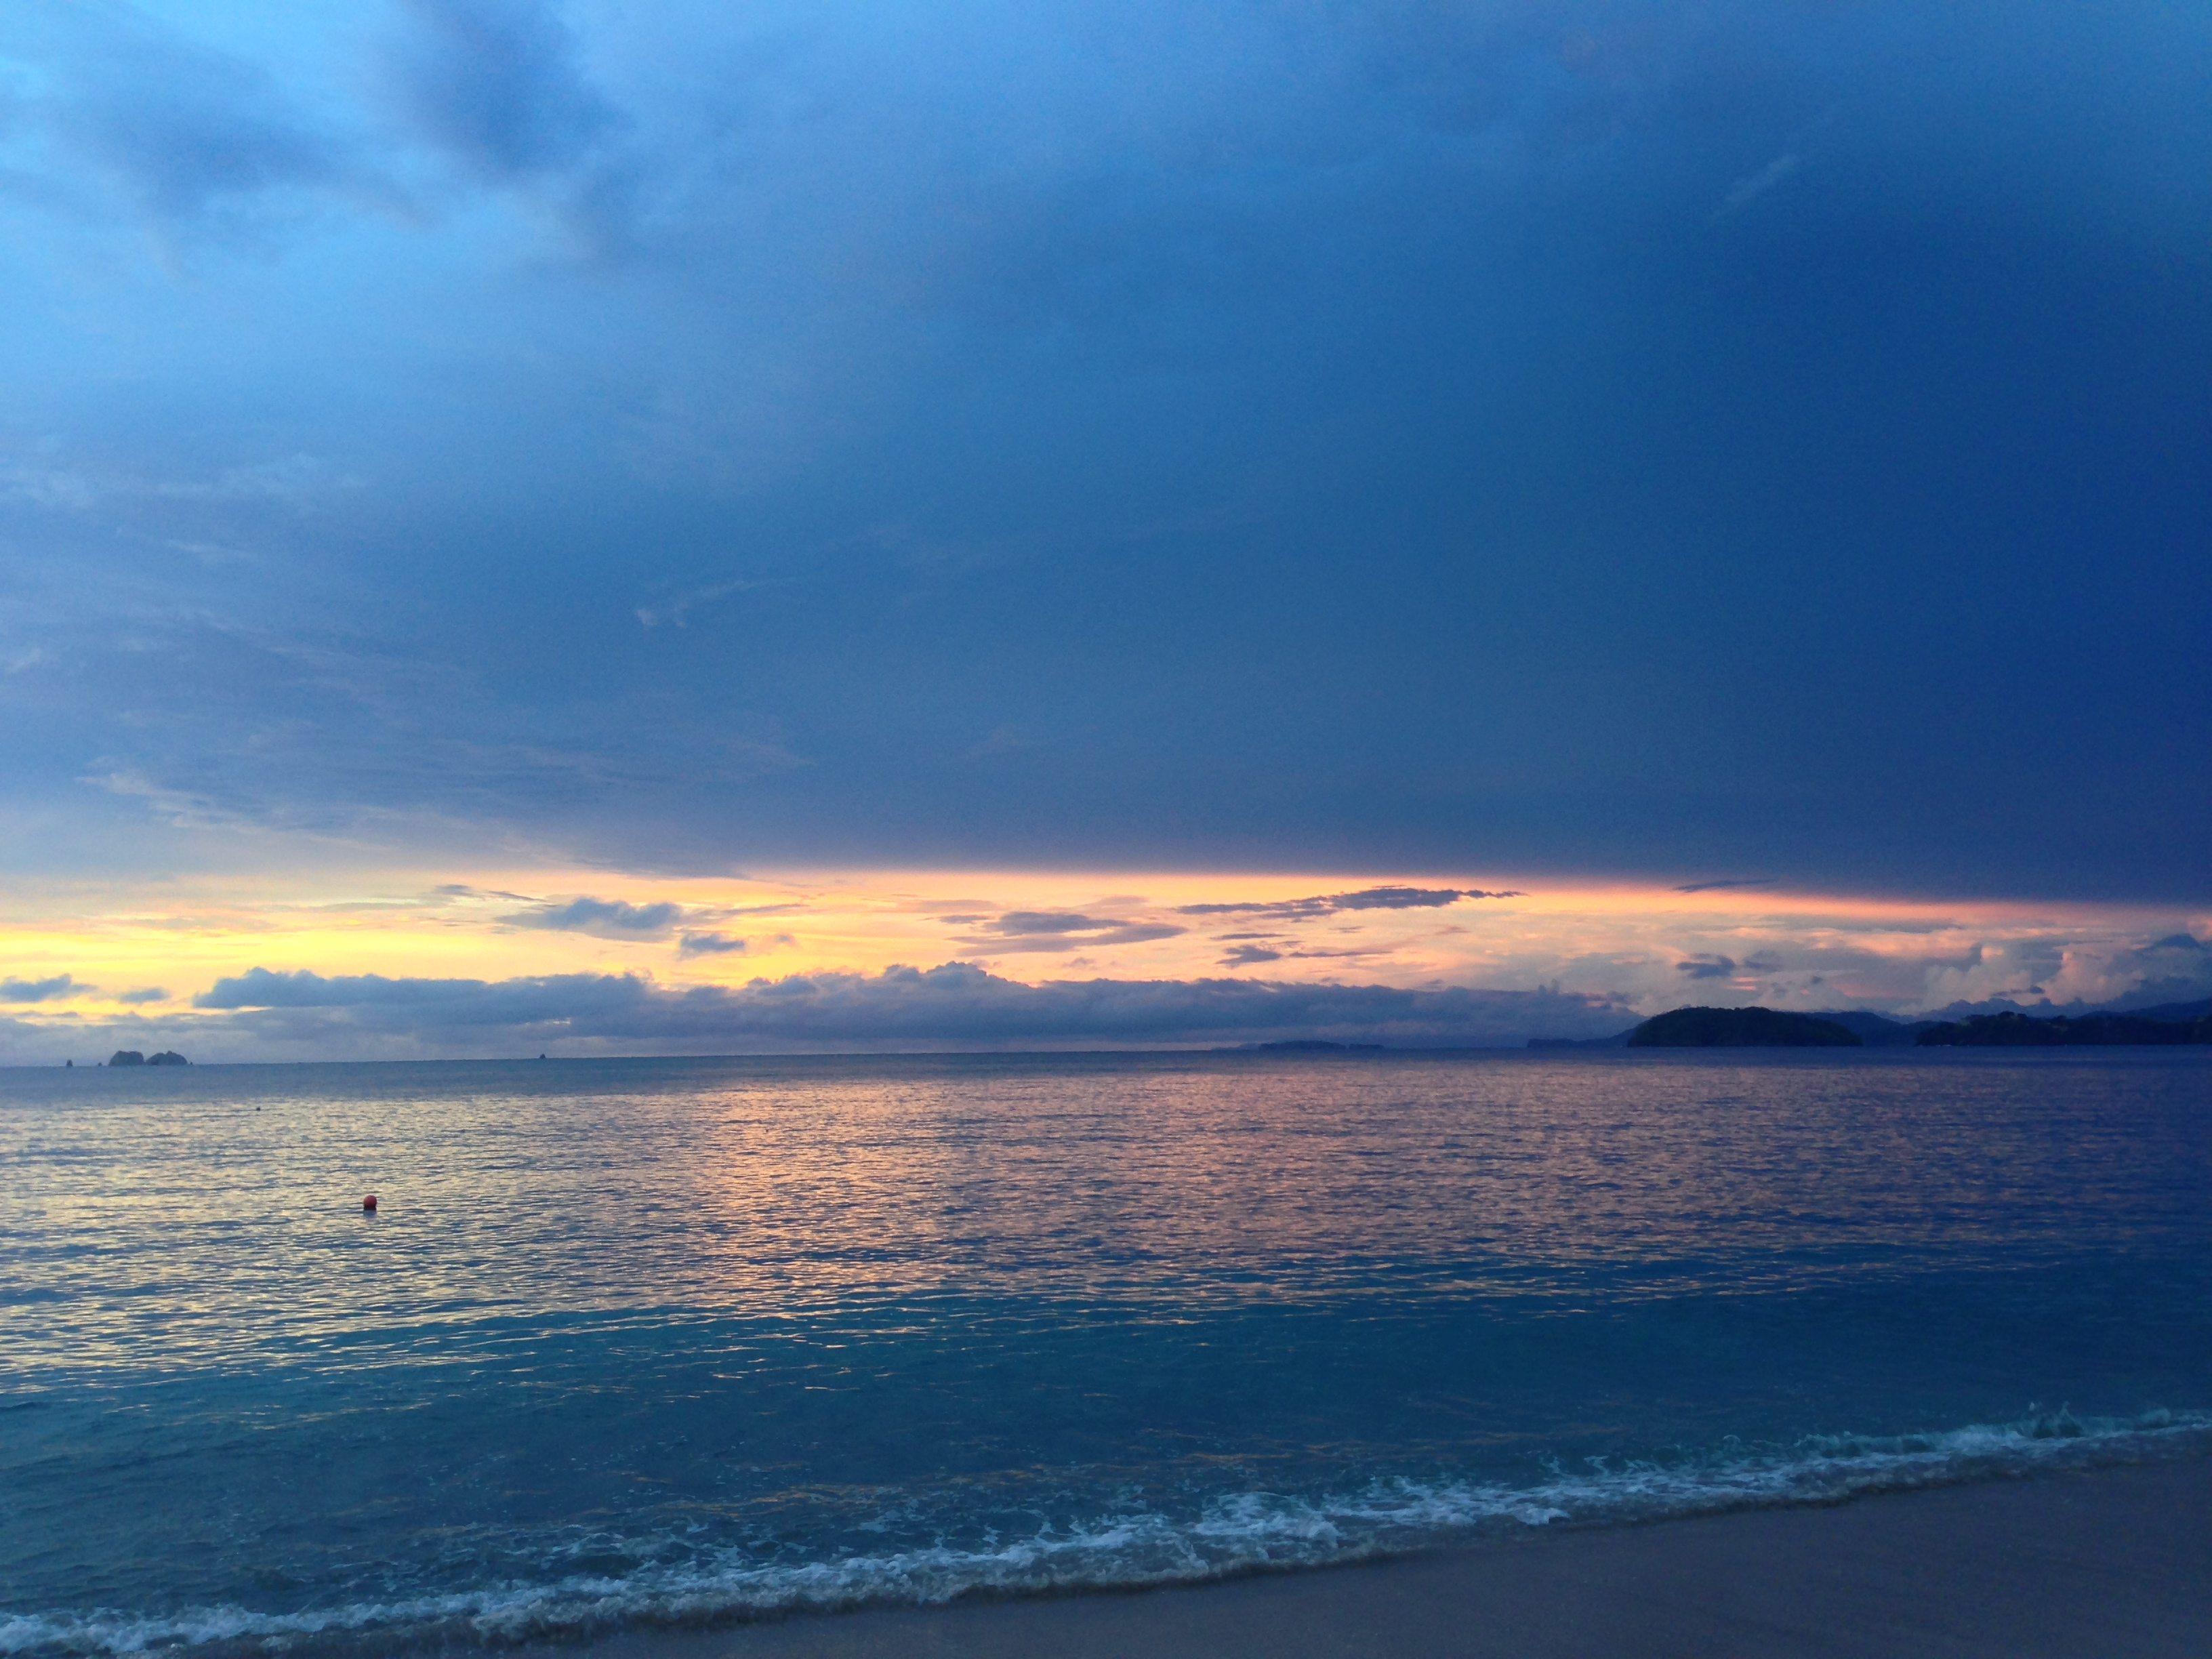 costa rica- blue ocean